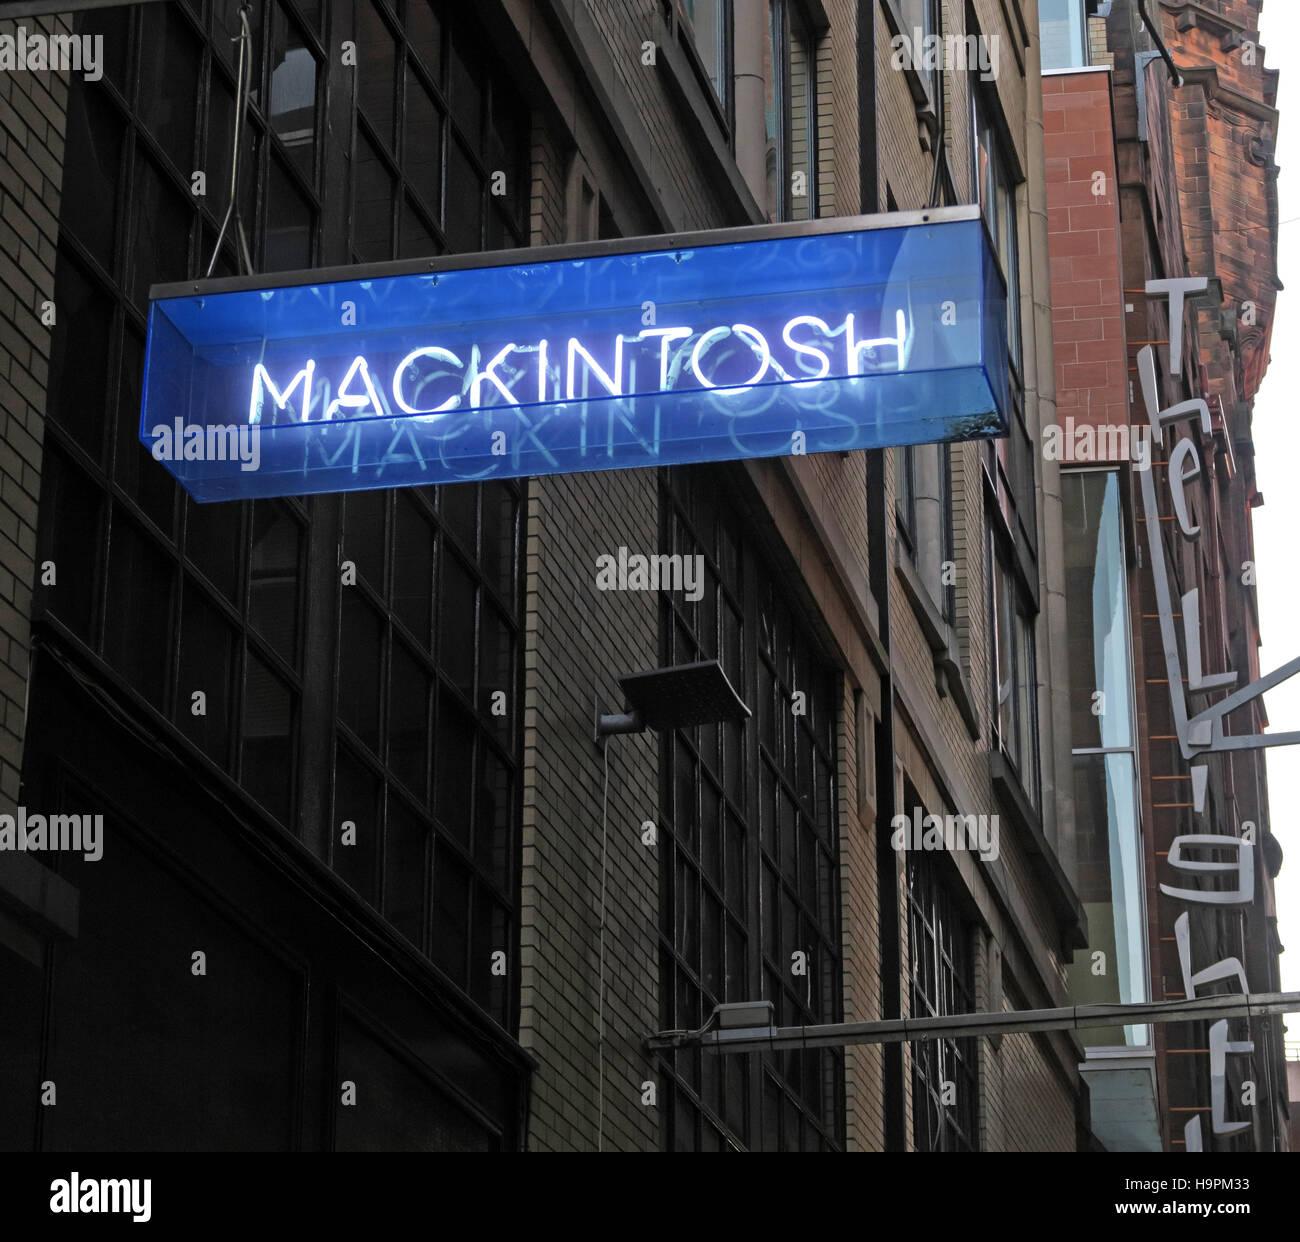 City,Centre,art,design,neon,sign,Glasgow,Scotland,UK,culture,architecture,G1,3NU,ln,tourist,tourism,travel,location,destination,designer,blue,Neon Sign,The Lighthouse,Mitchell Lane,G1 3NU,blue neon,GoTonySmith,@HotpixUK,Tony,Smith,UK,GB,Great,Britain,United,Kingdom,Scottish,Scots,British,Scotland,Buy Pictures of,Buy Images Of,Images of,Stock Images,Tony Smith,United Kingdom,Great Britain,British Isles,Charles Rennie Mackintosh,Rennie Mackintosh,Glasgow School,The Glasgow School